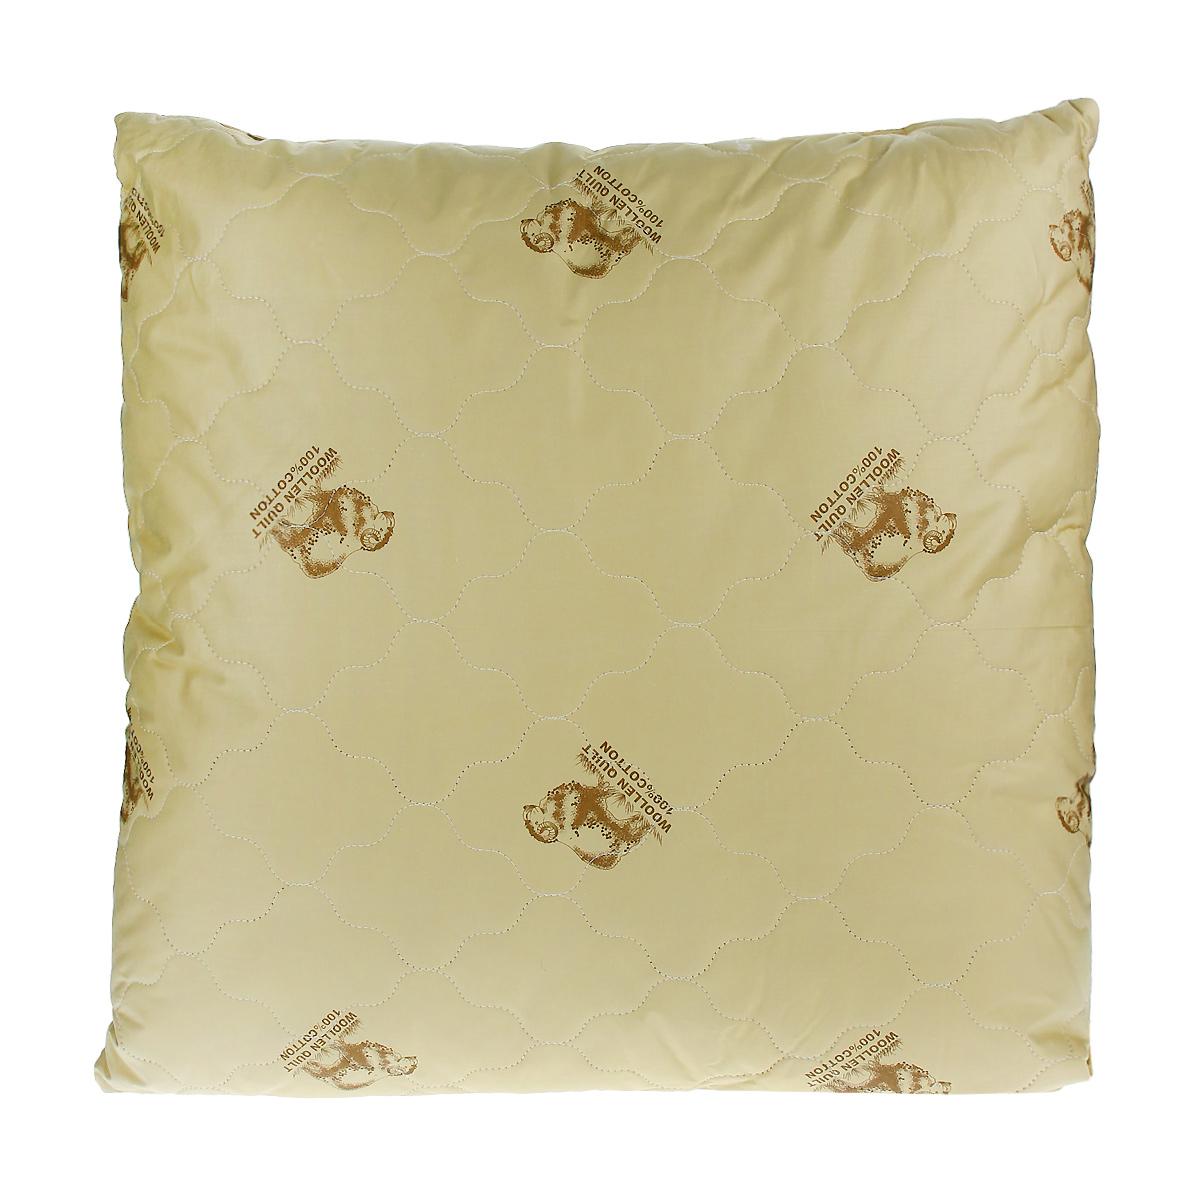 Подушка Овечка, цвет: темно-бежевый, 68 х 68 см2908-68-07 темно-бежевый